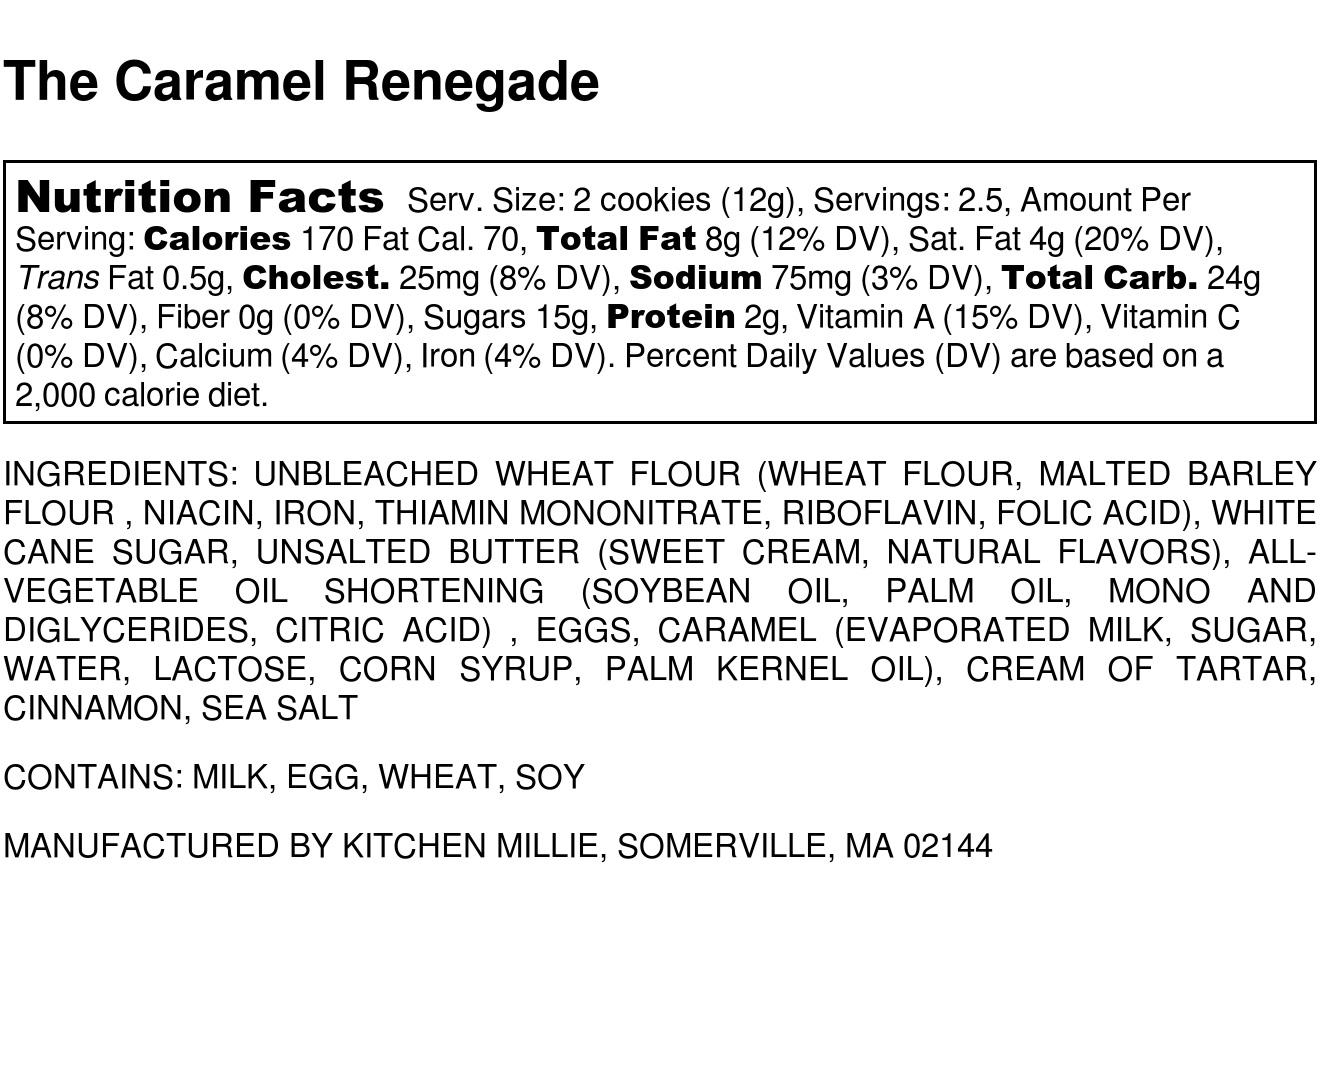 The Caramel Renegade  - Nutrition Label.jpg